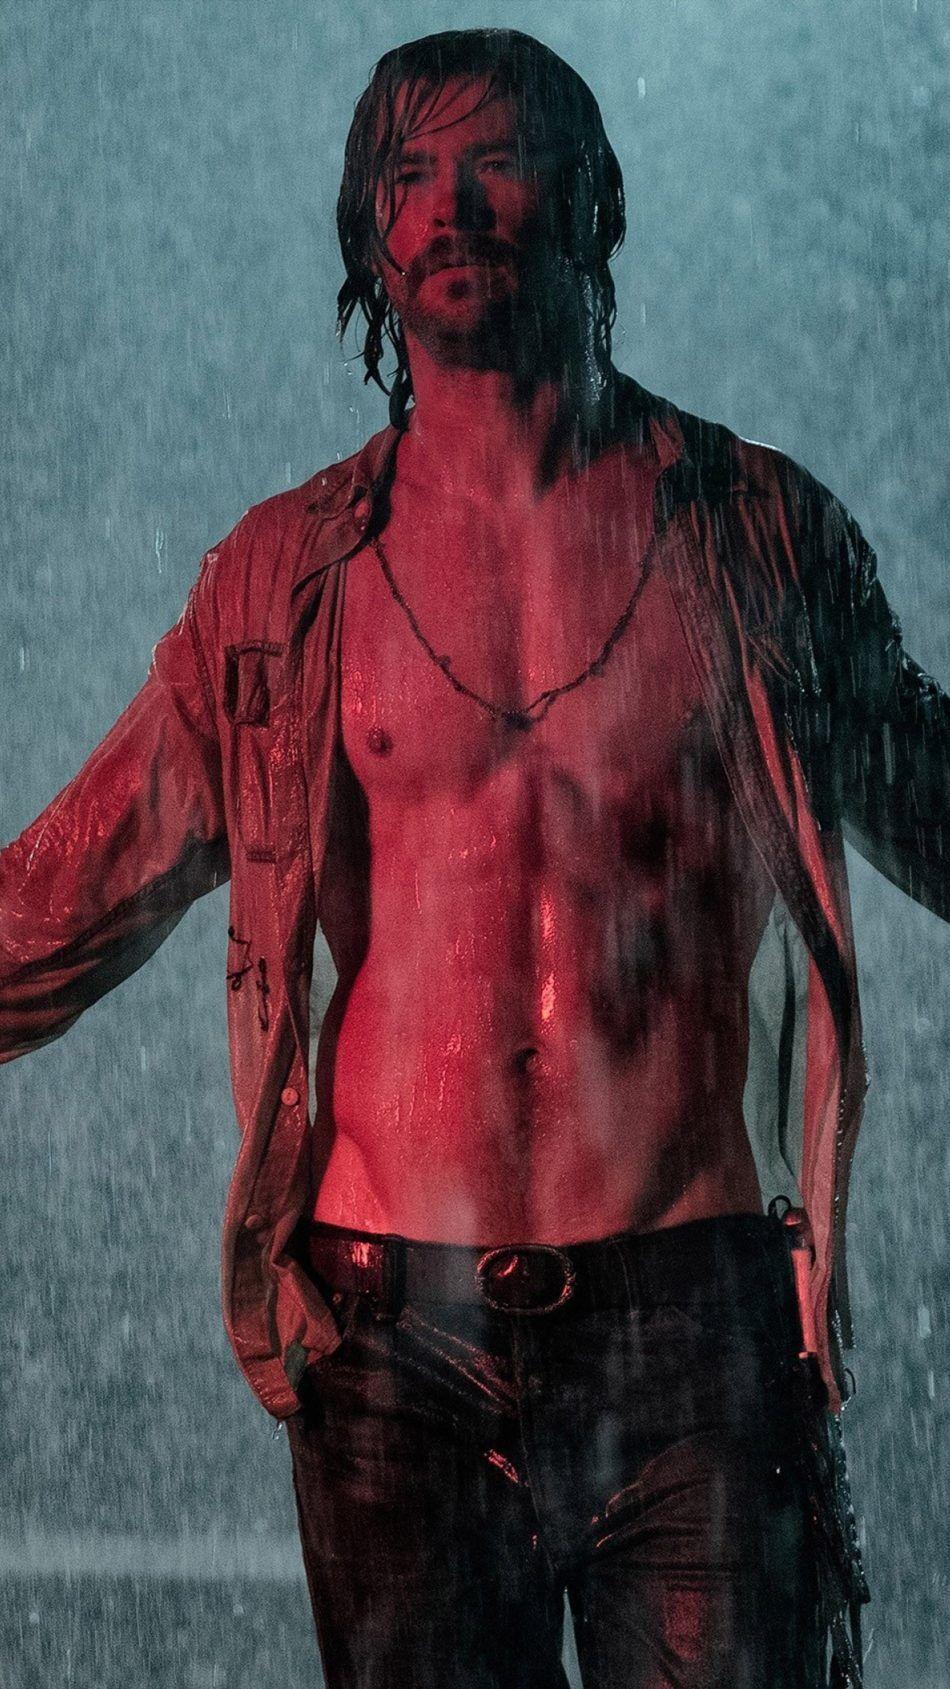 Chris Hemsworth In Bad Times At The El Royale Chris Hemsworth